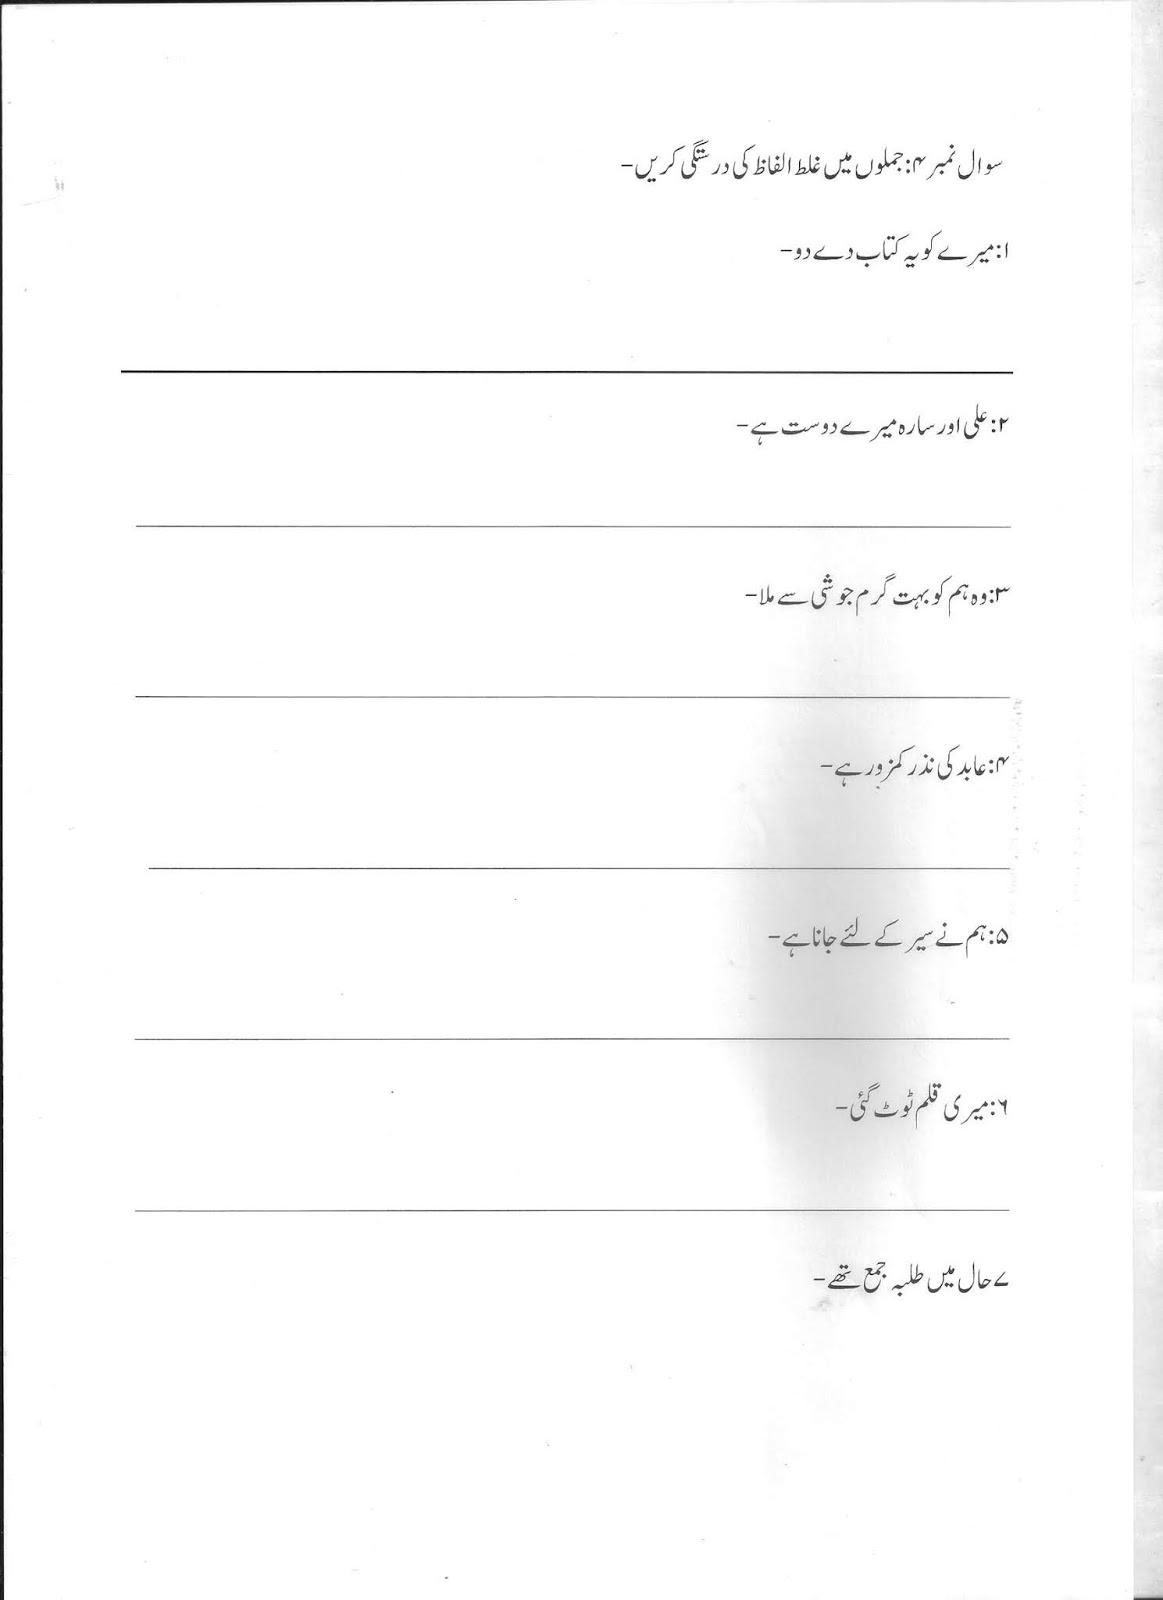 Urdu Revision Worksheet (3rd Class Test)